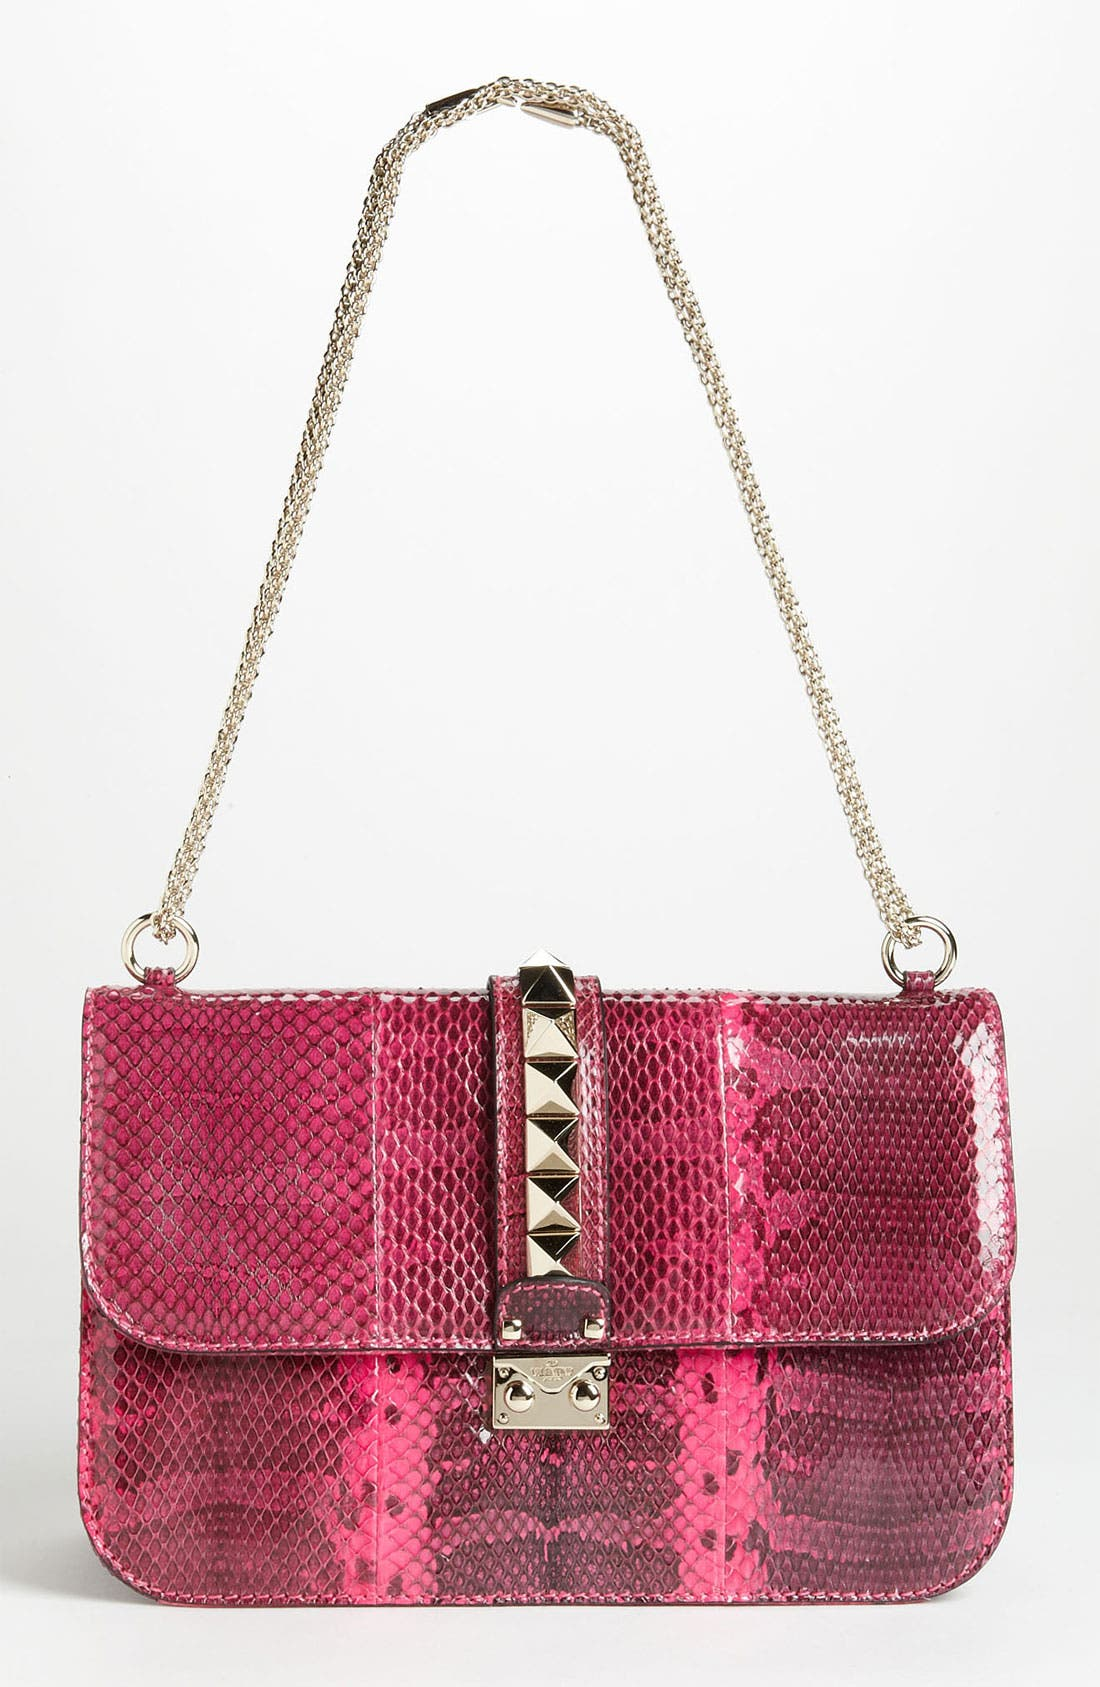 Alternate Image 1 Selected - Valentino 'Lock - Medium' Genuine Snakeskin Shoulder Bag